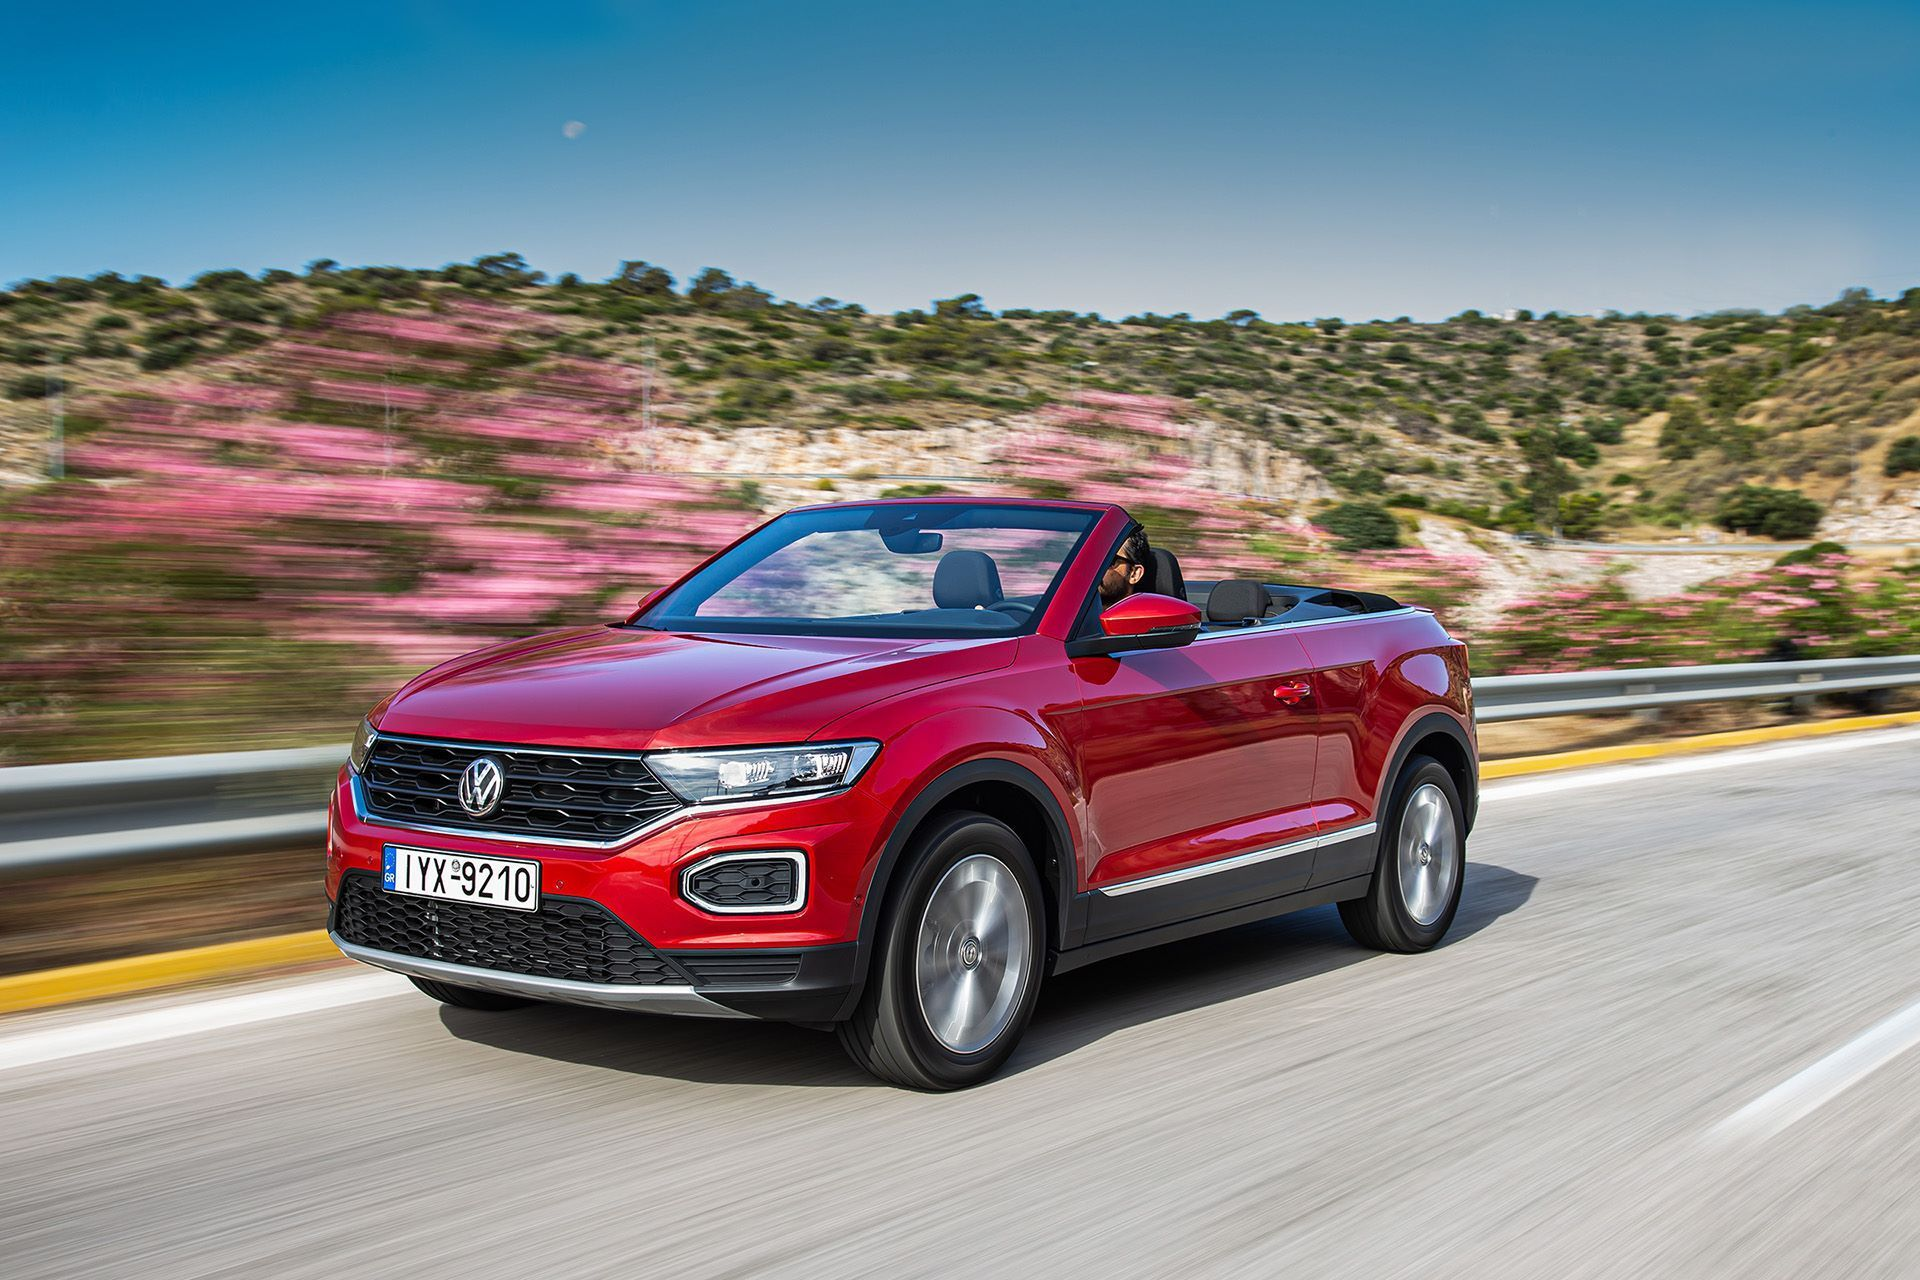 Volkswagen-T-Roc-Cabriolet-Greece-57